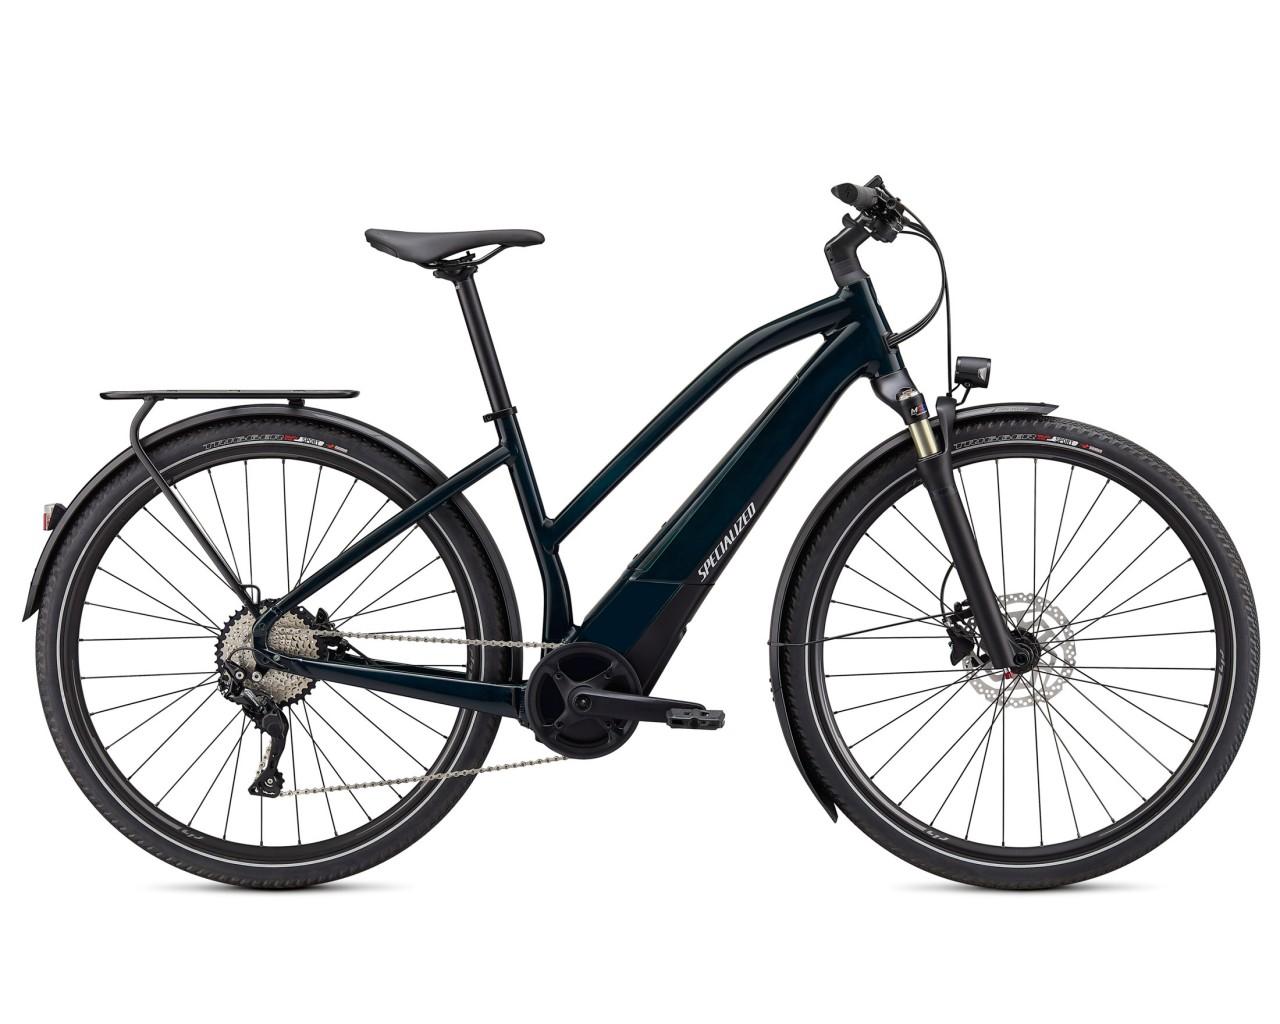 Specialized Vado 4.0 Step Through - Pedelec Trekking Bike 2021   forest green-black-liquid silver